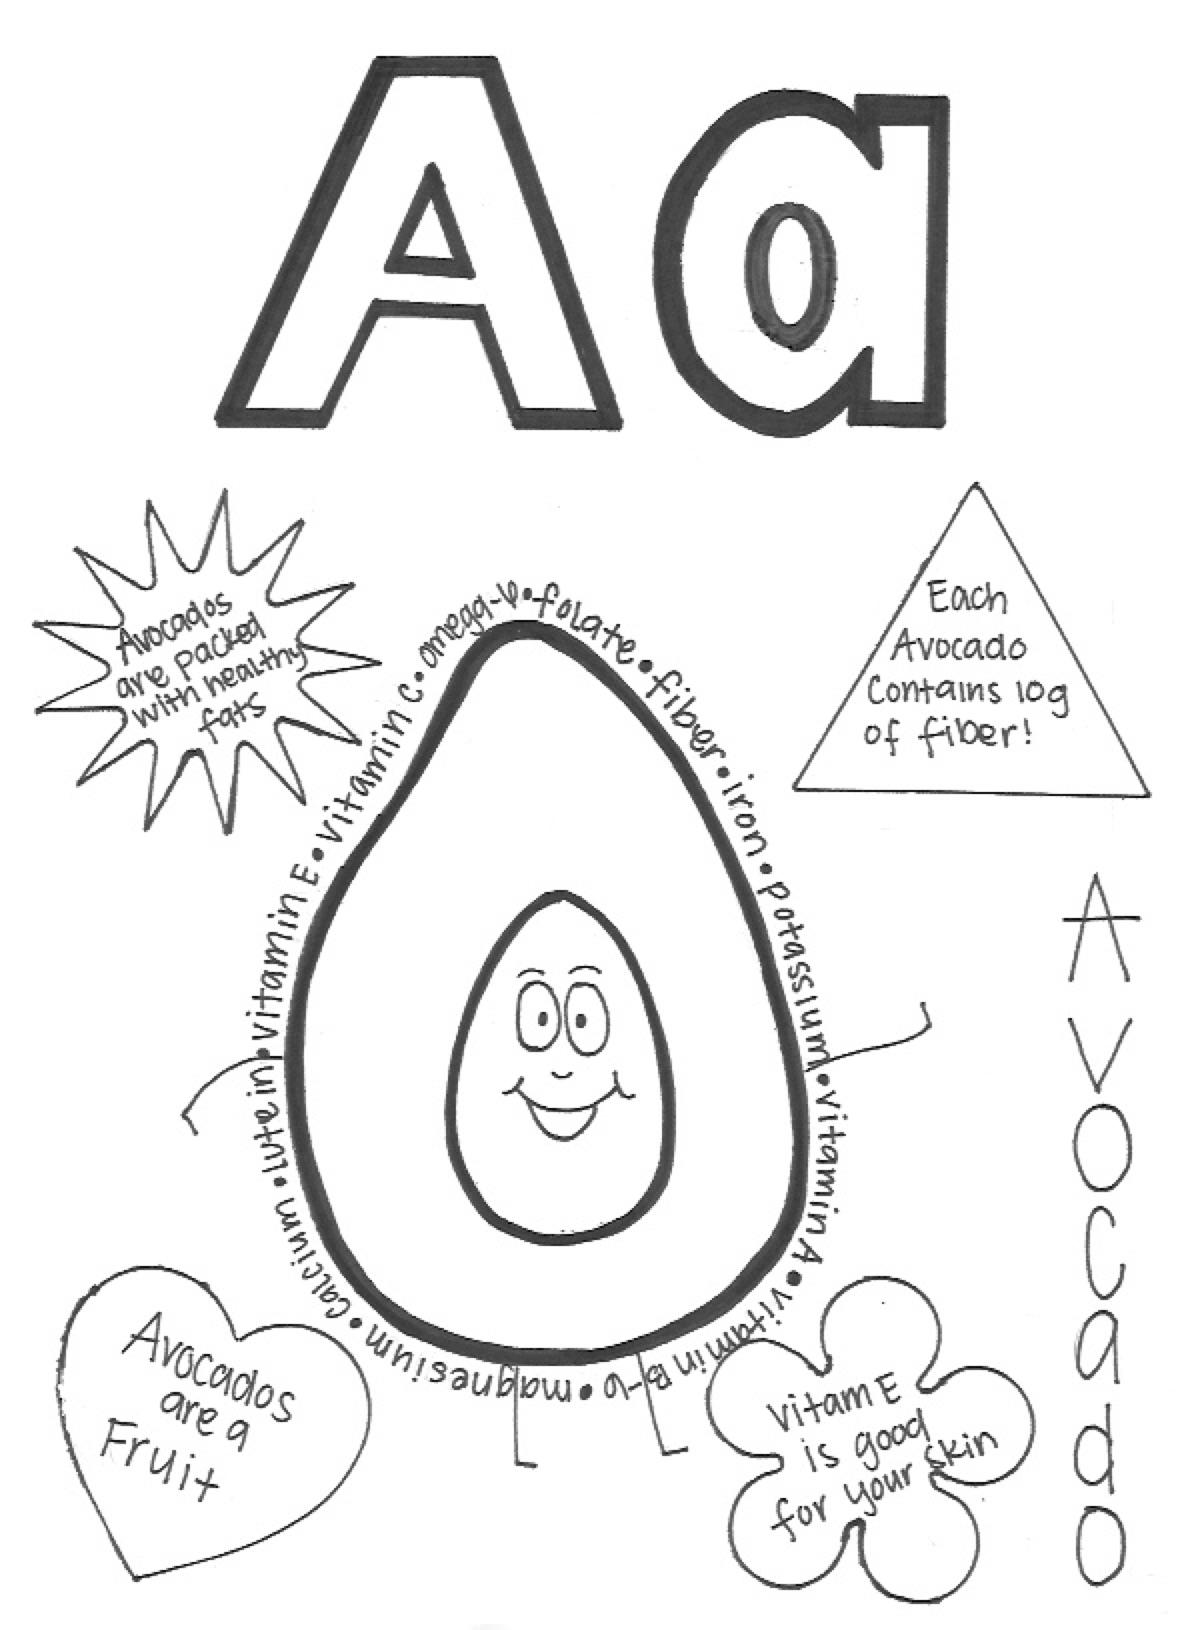 a avocado coloring page berry lemony a avocado coloring page berry lemony